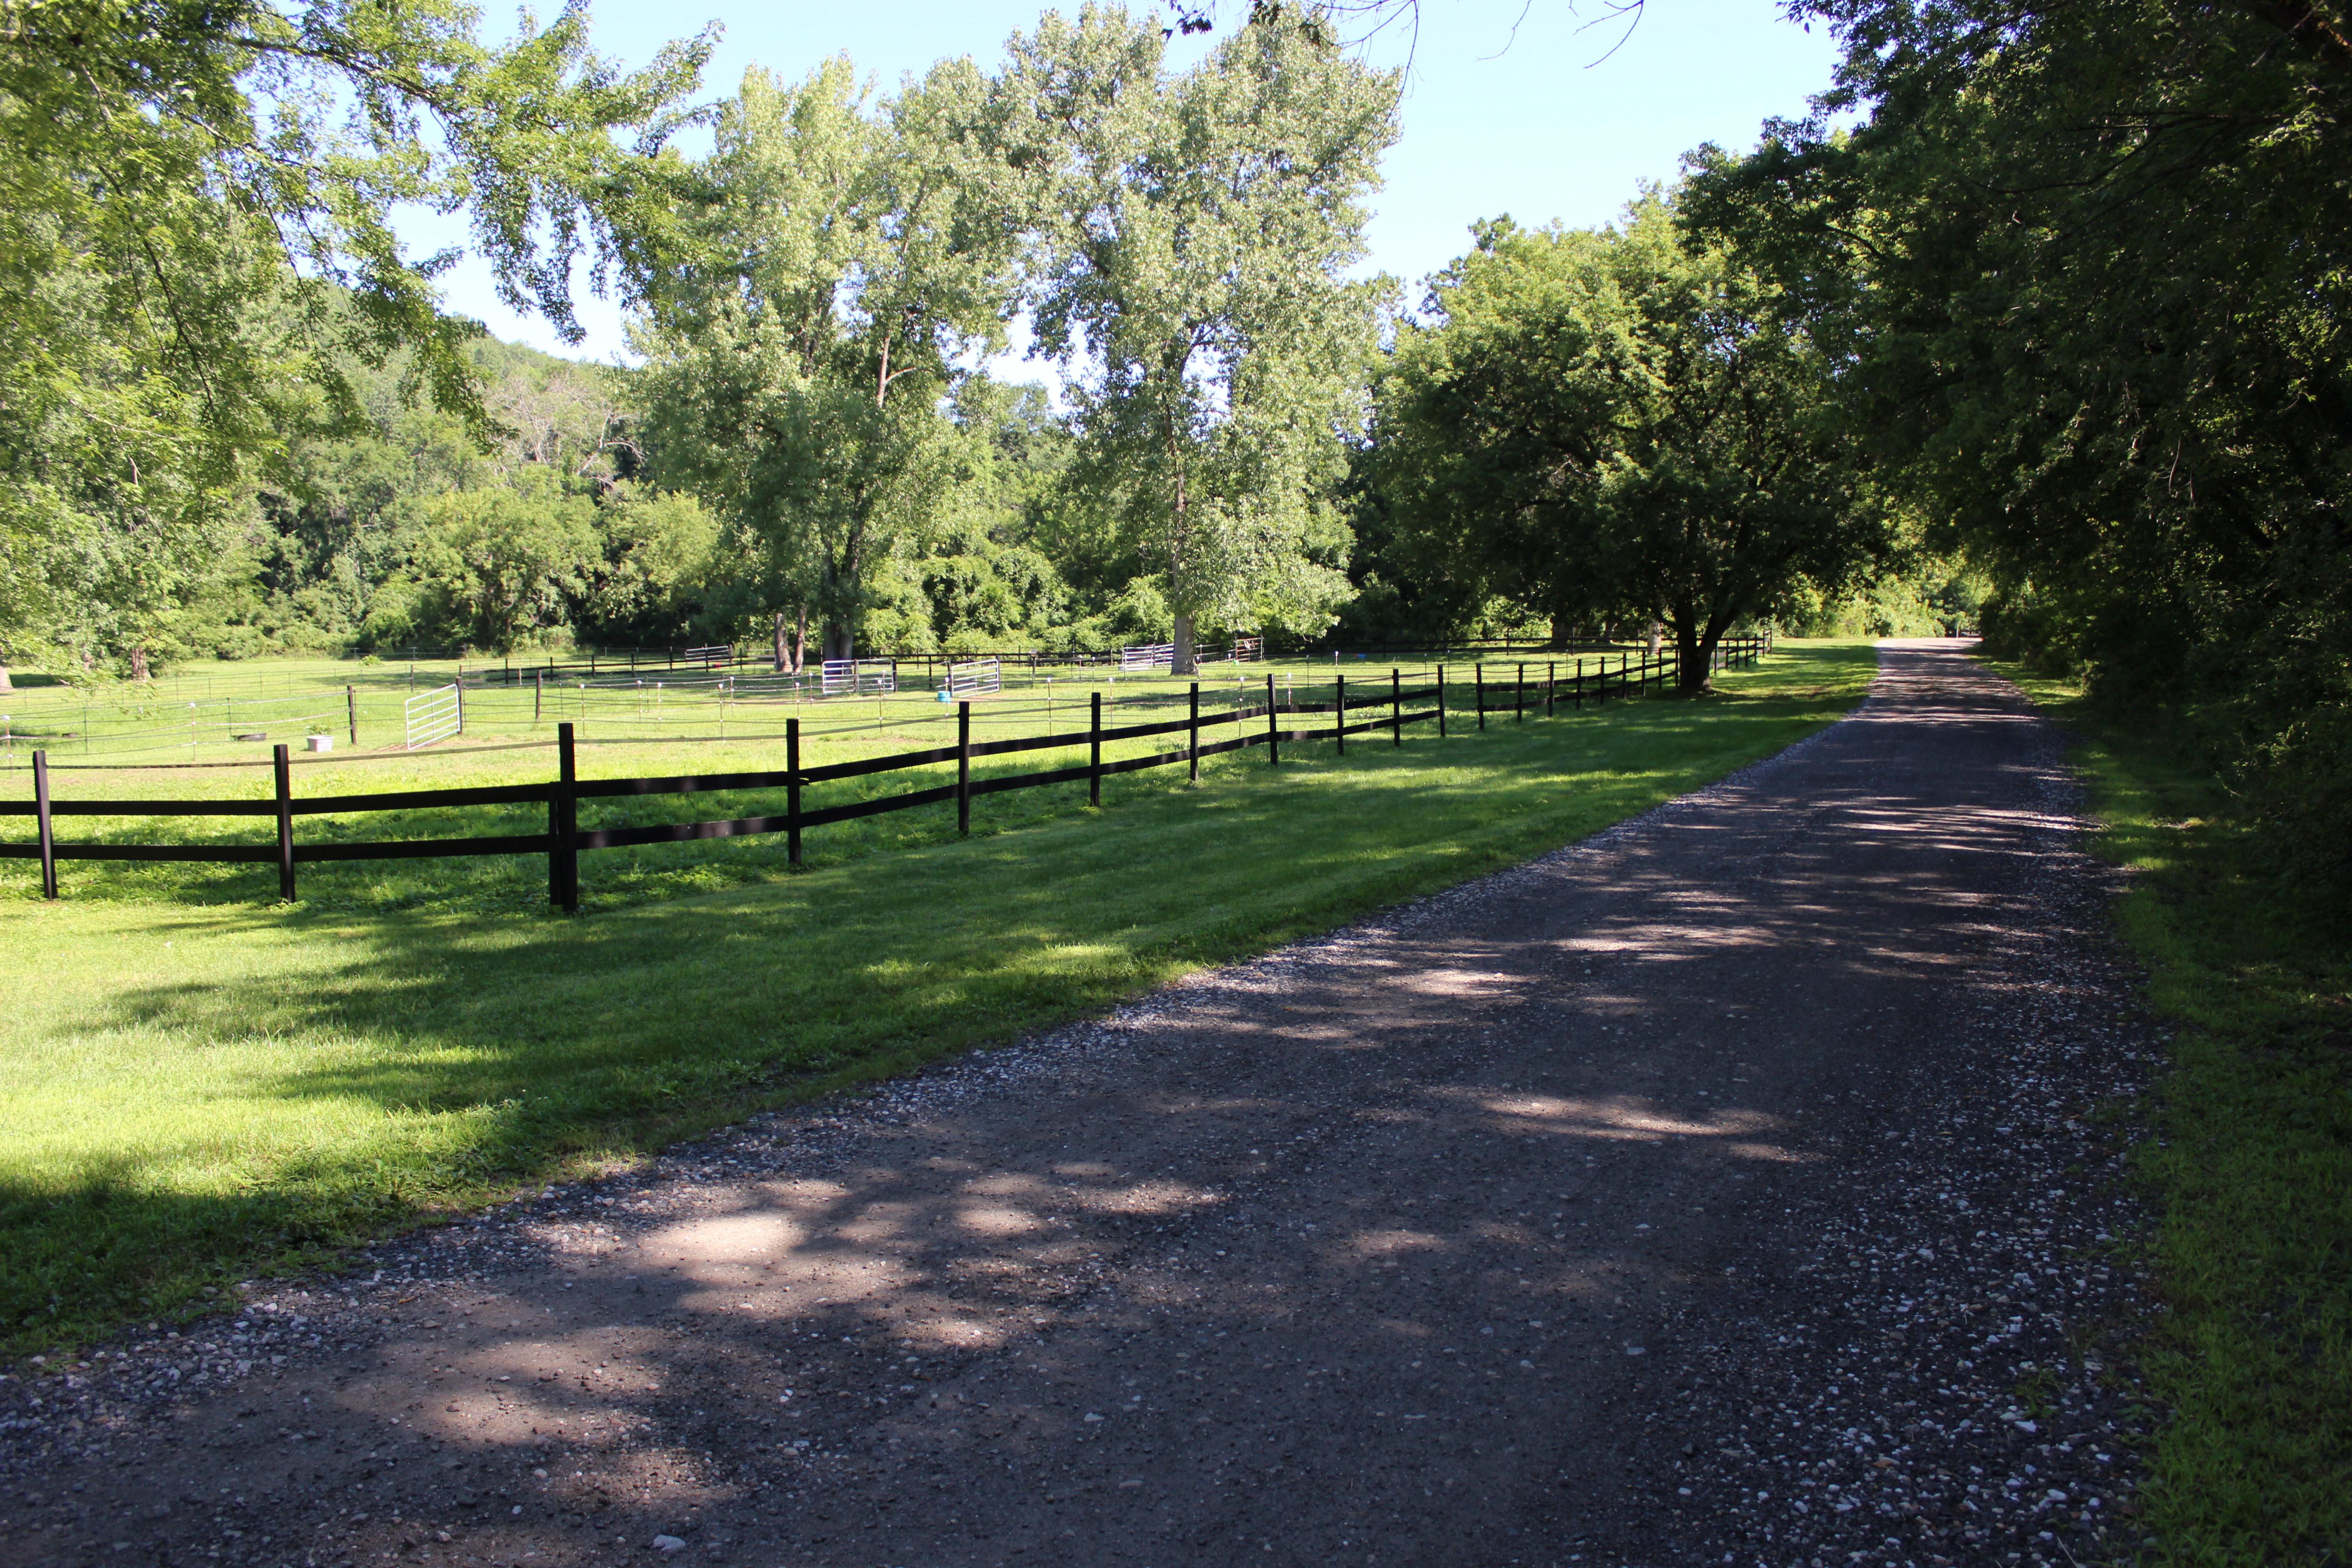 Terreno por un Venta en Up and Running Horse Farm 8 Wells Rd New Milford, Connecticut, 06776 Estados Unidos